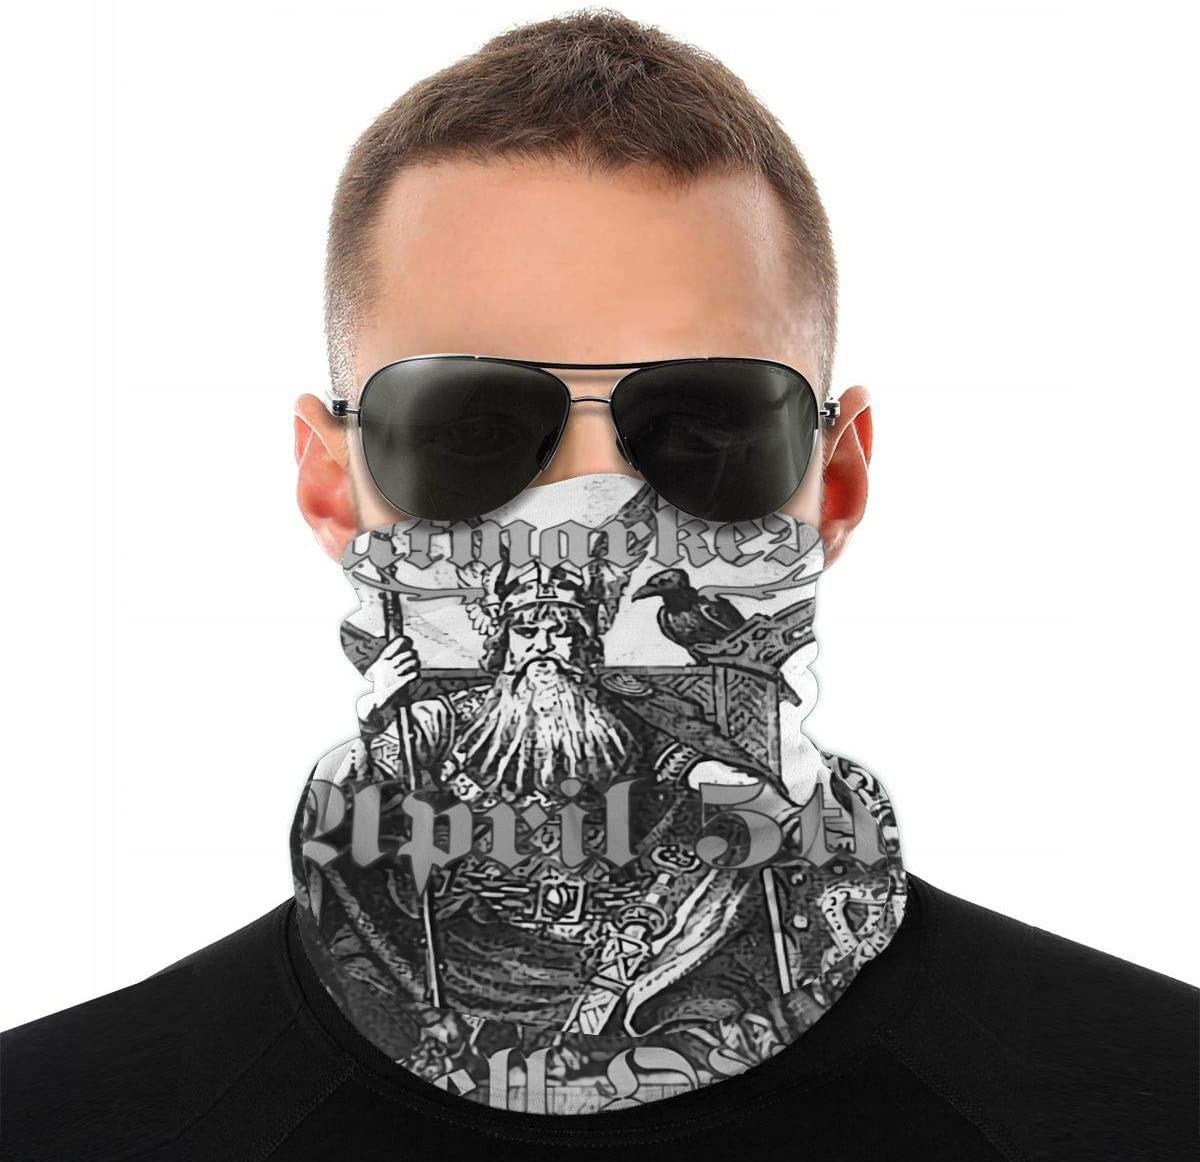 Atoyyre Odin Head Scarf Multi Function Scarf